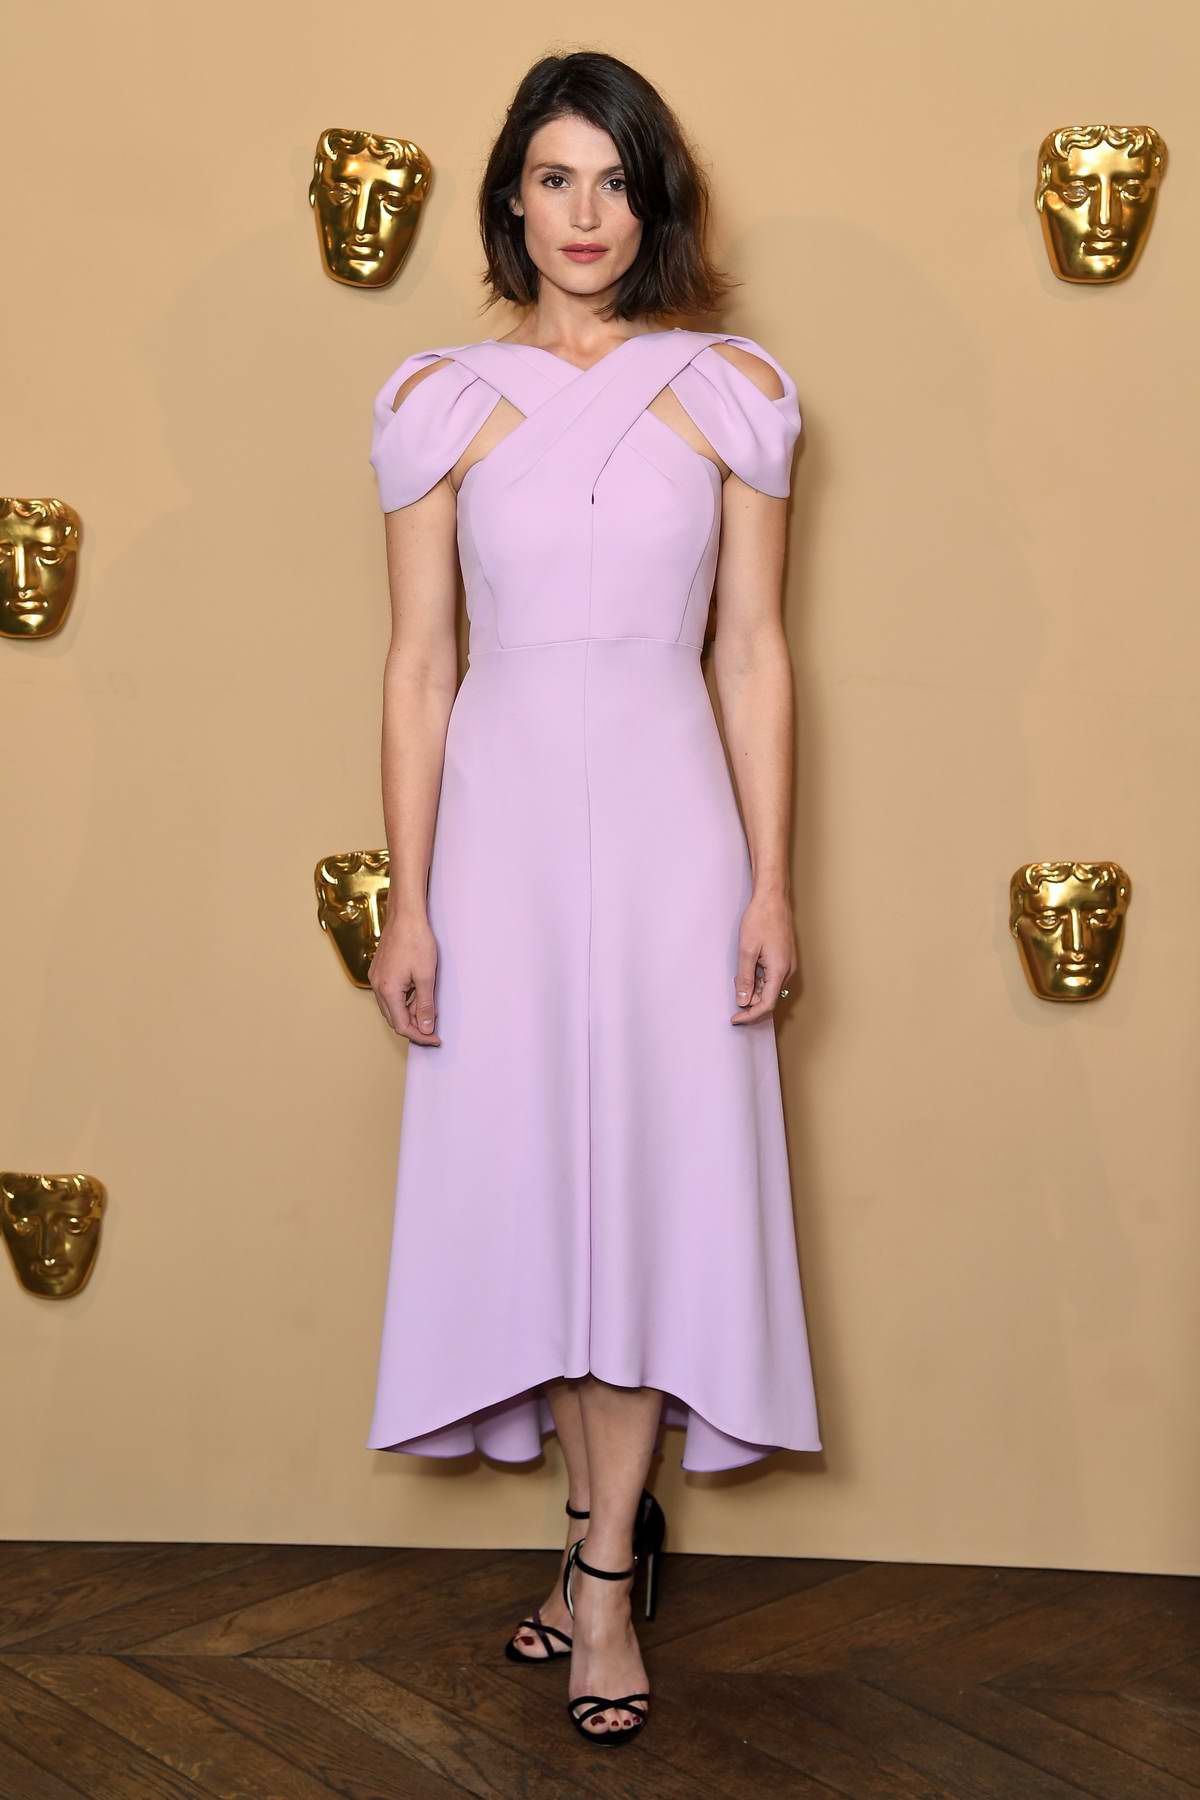 Gemma Arterton attends BAFTA Breakthrough Brits in London, UK